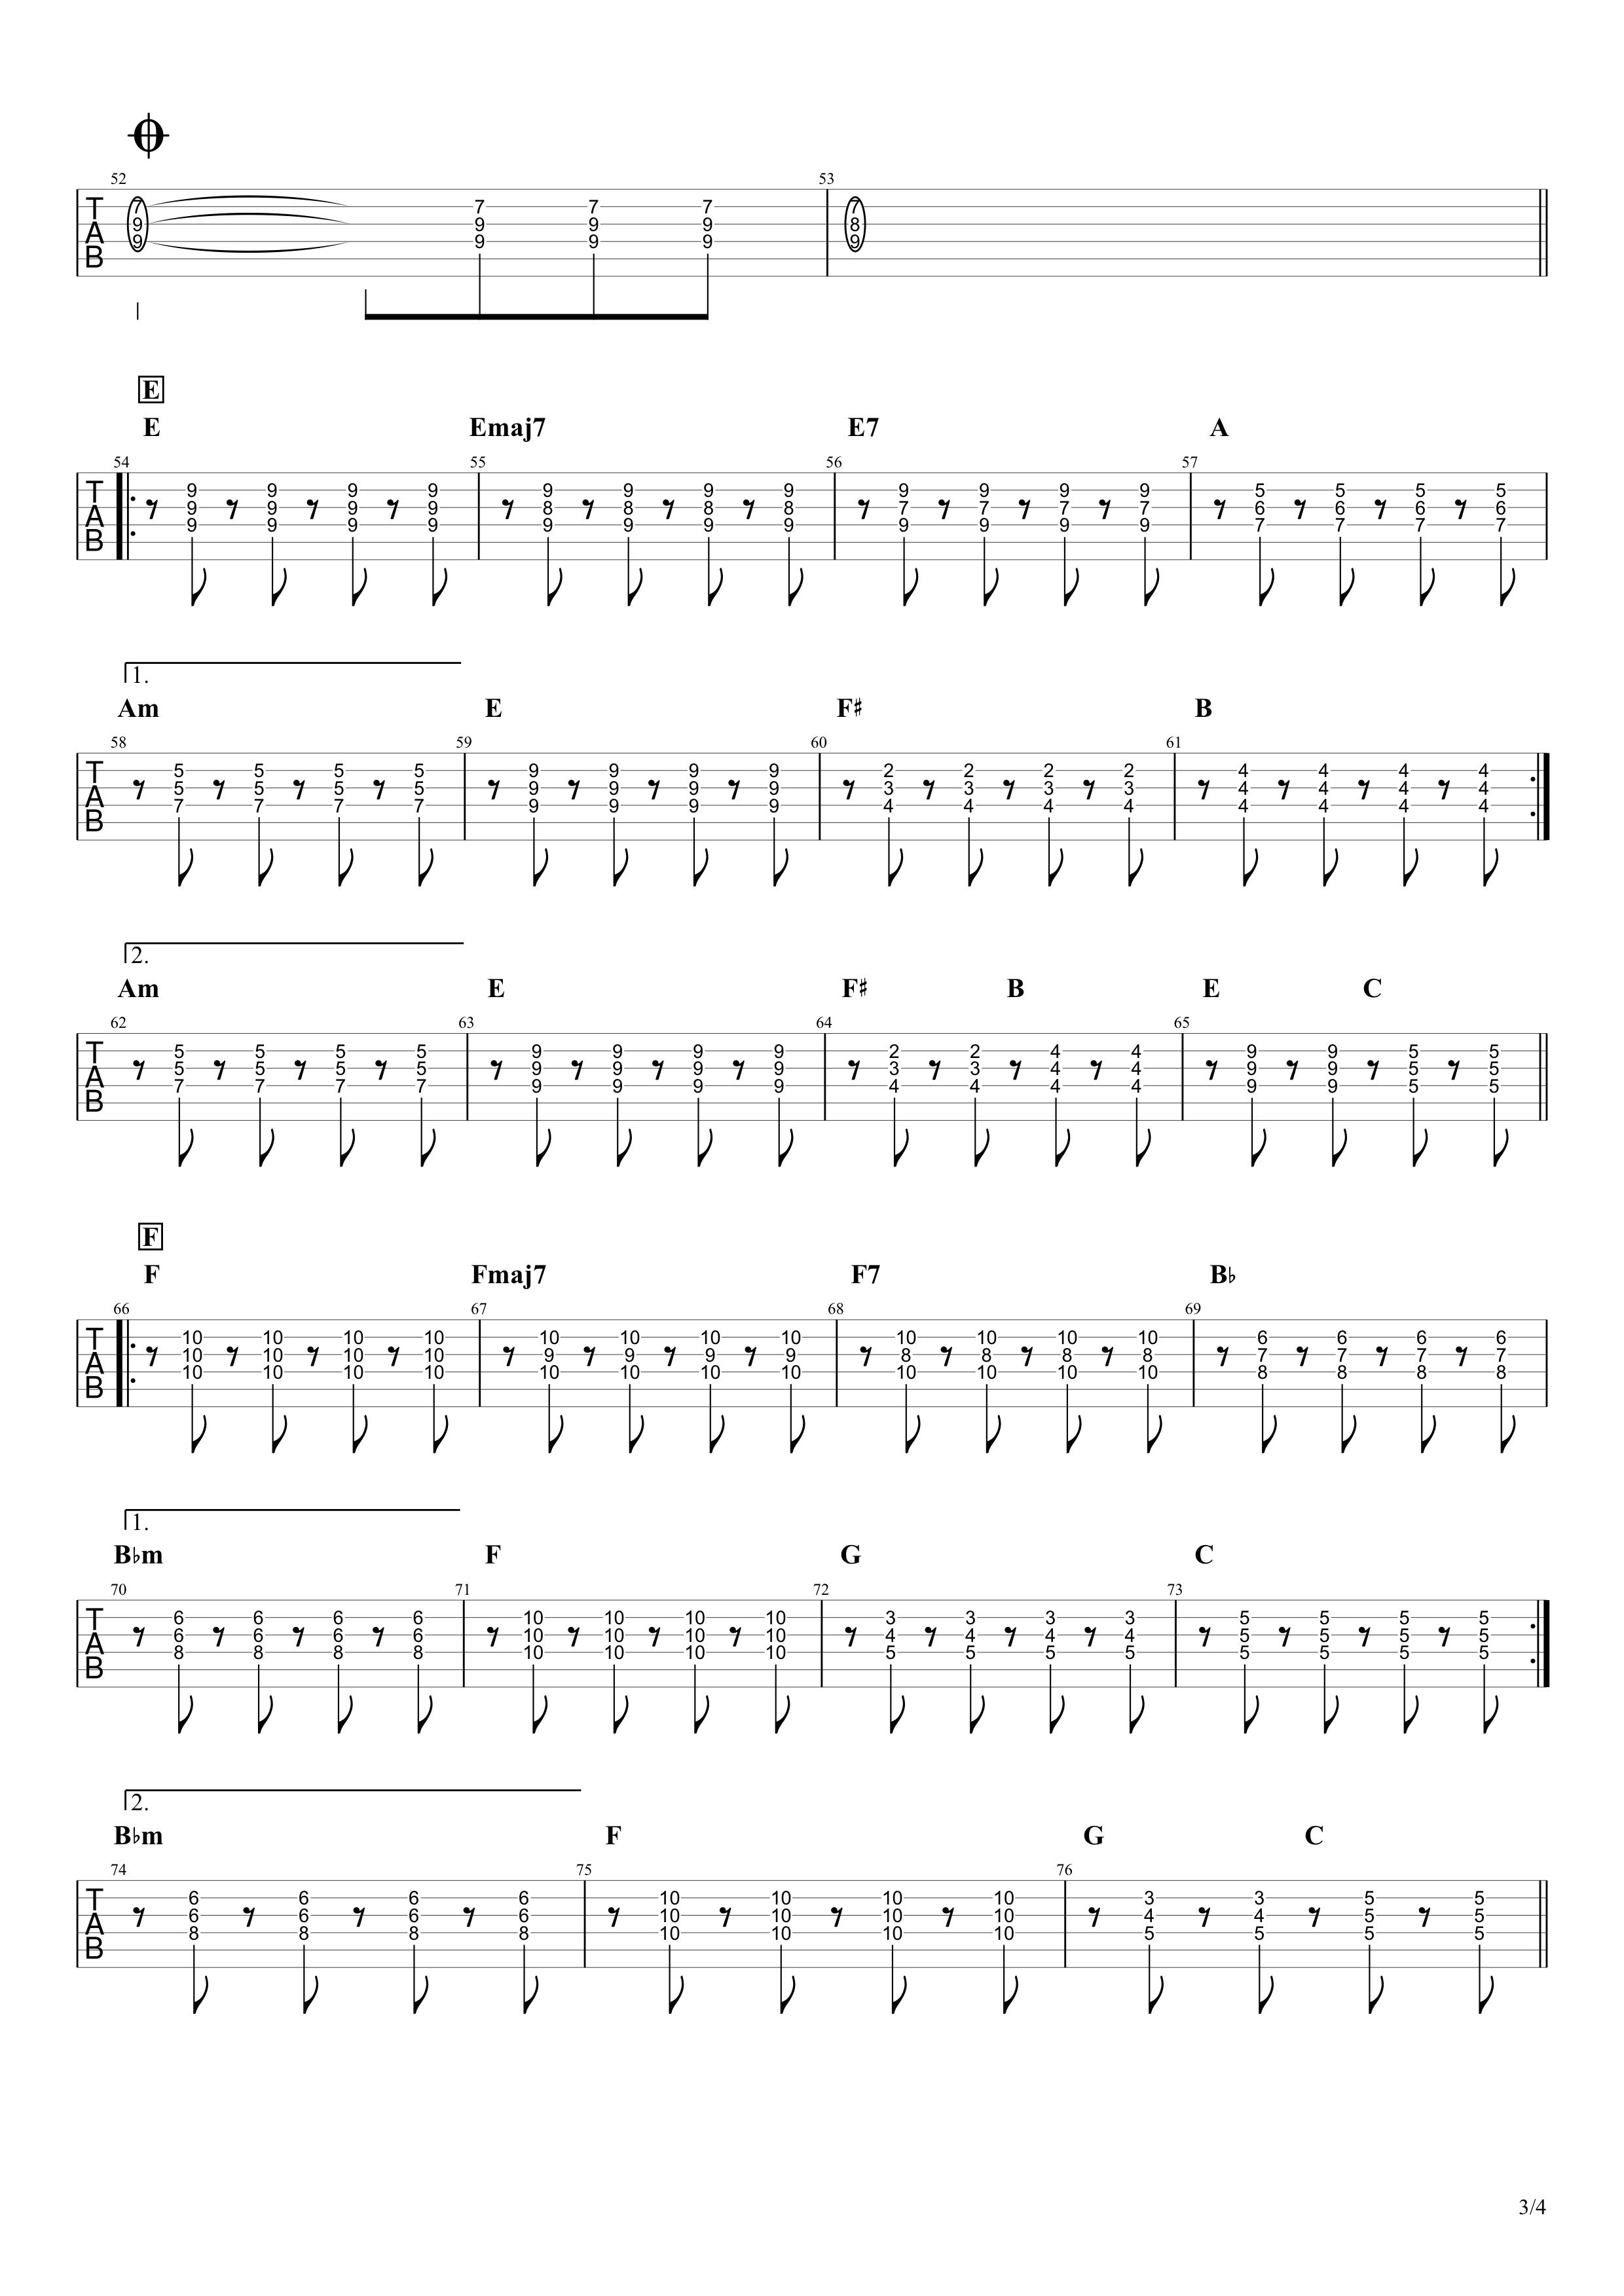 Diamonds(ダイアモンド)/PRINCESS PRINCESS ギタータブ譜 リードギターほぼ完コピVer.03